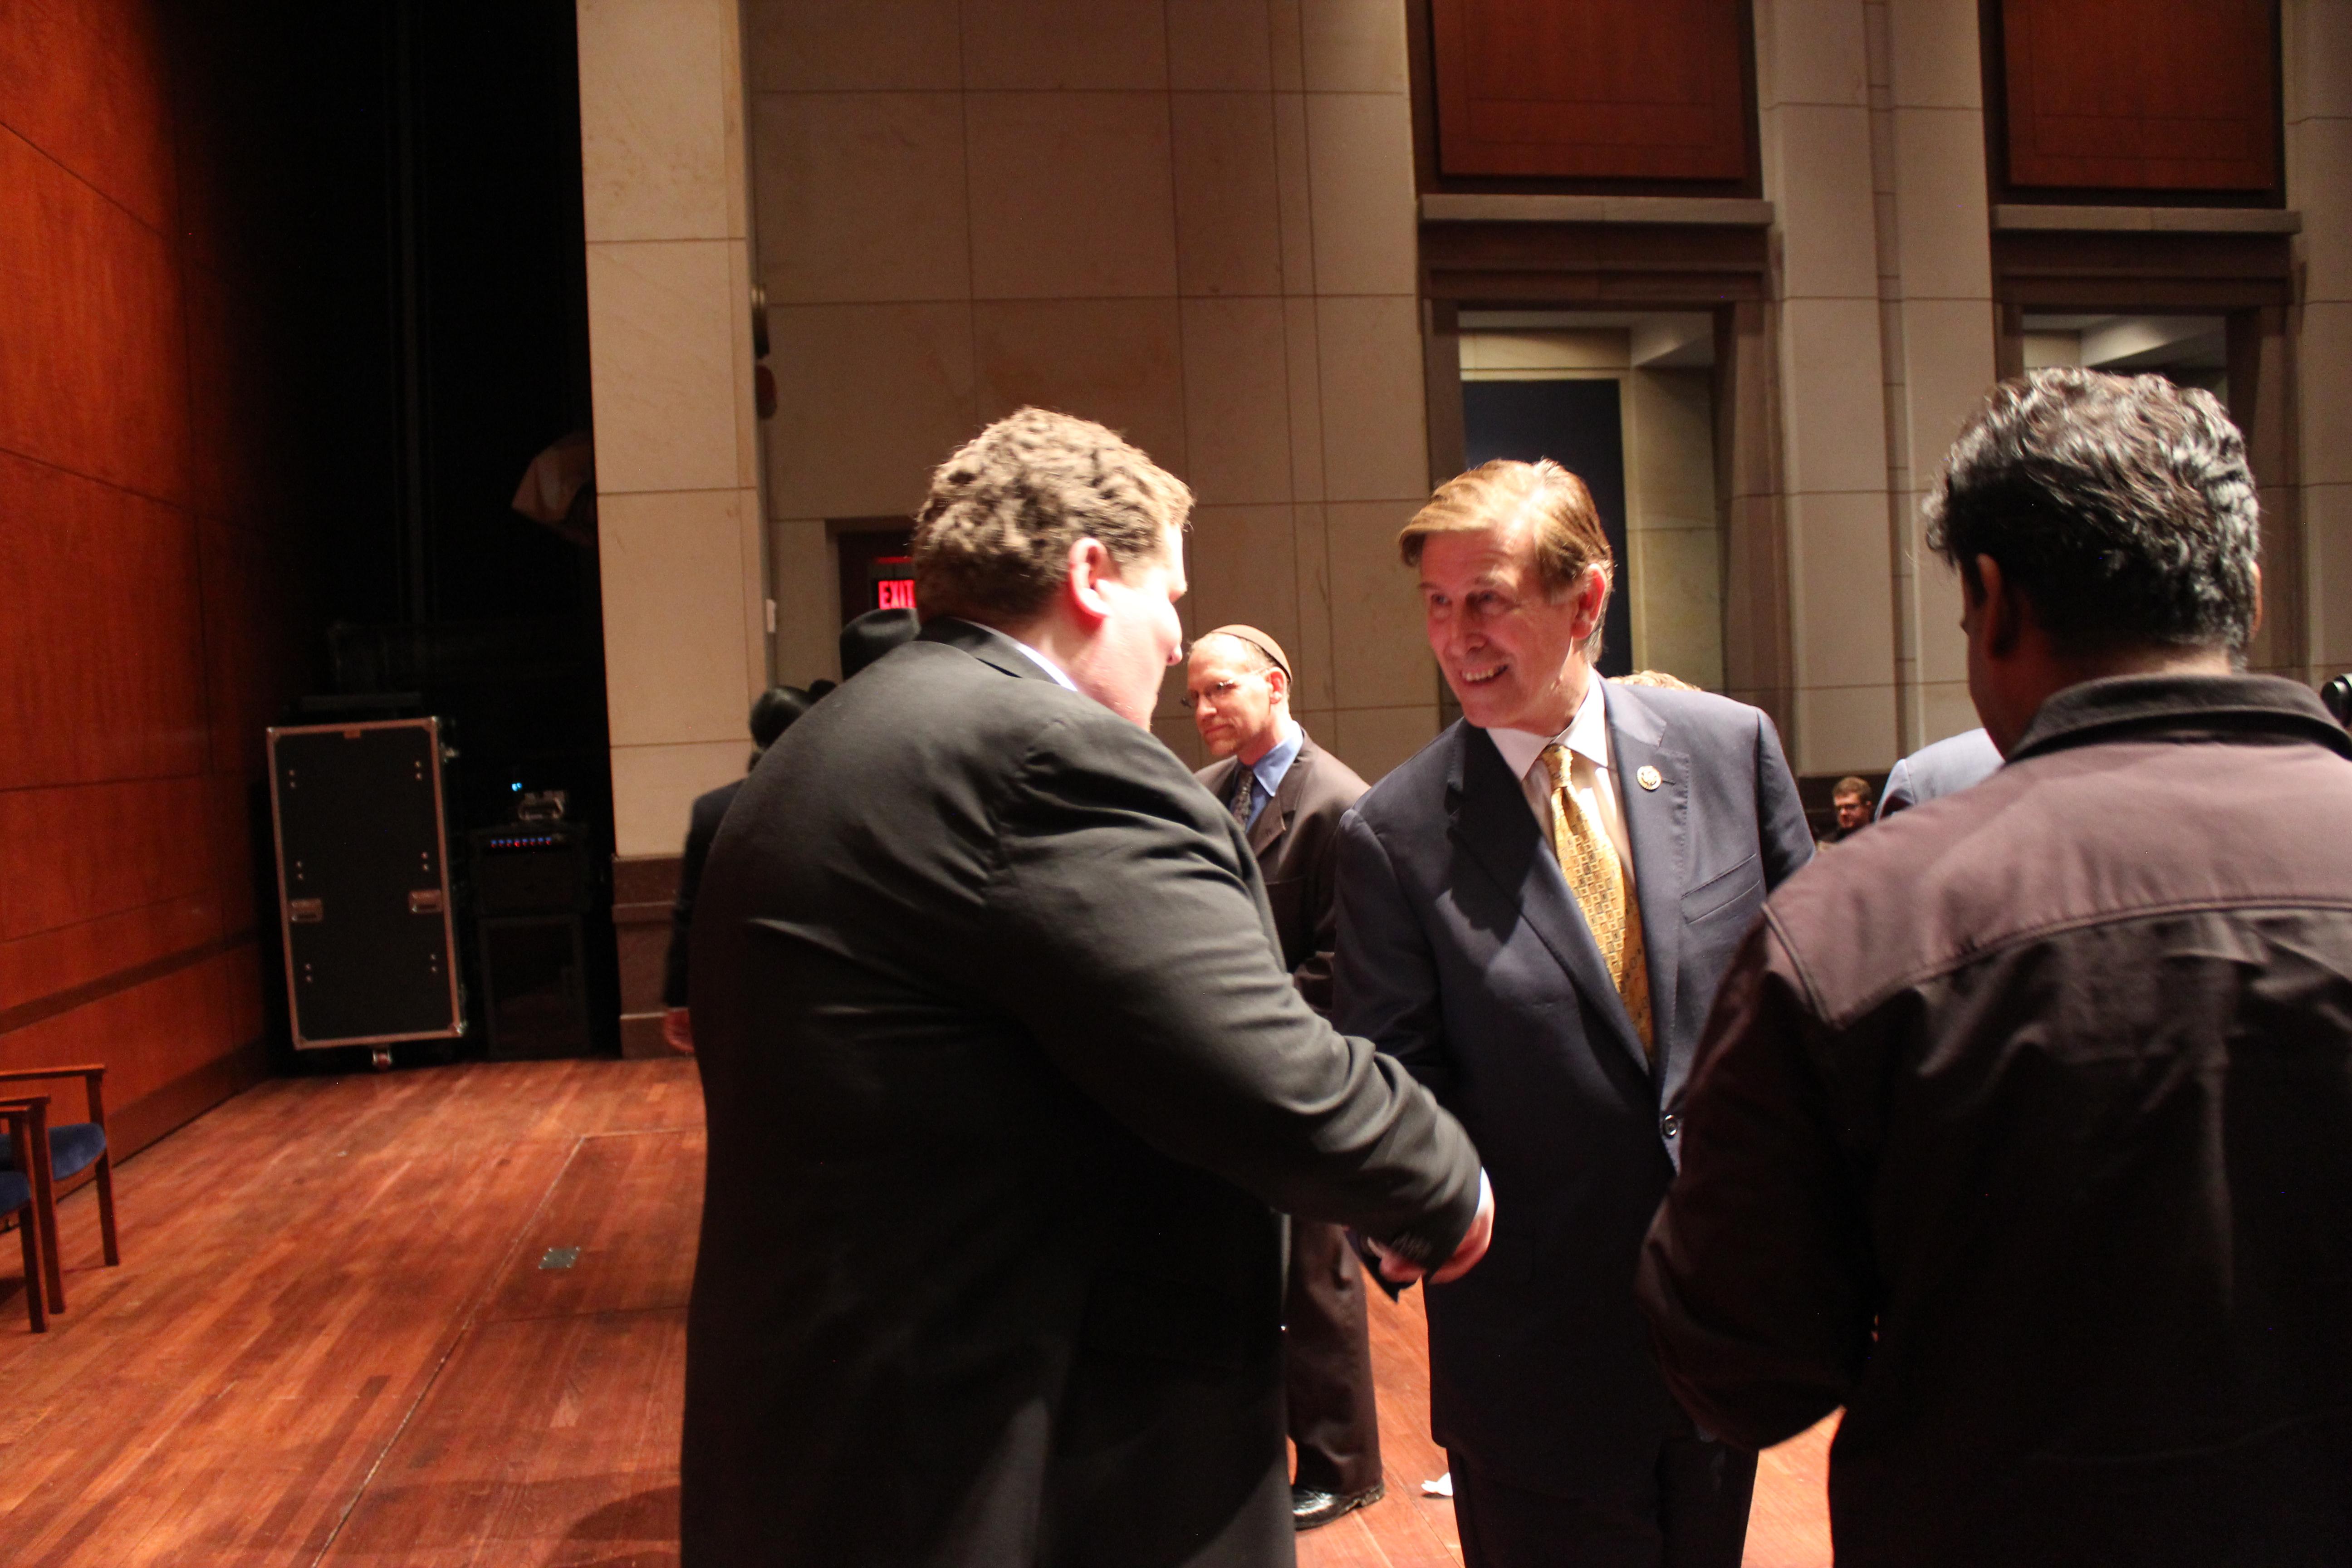 AHA Legislative Associate Matthew Bulger thanking Rep. Breyer sponsoring the legislation.